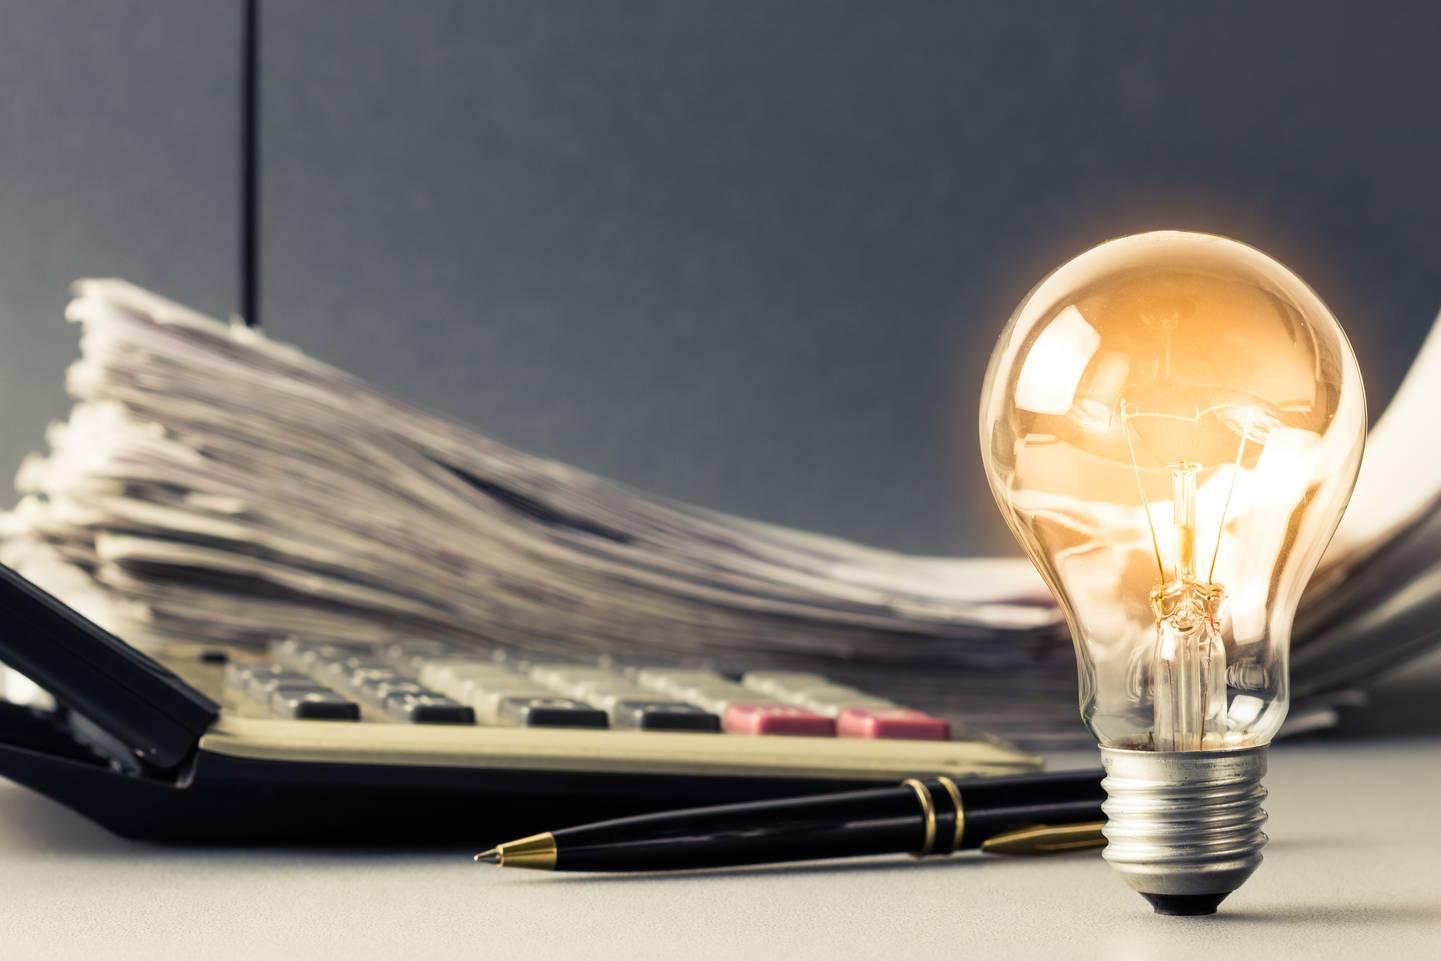 Smartes Energiemanagement mit Conrad Connect